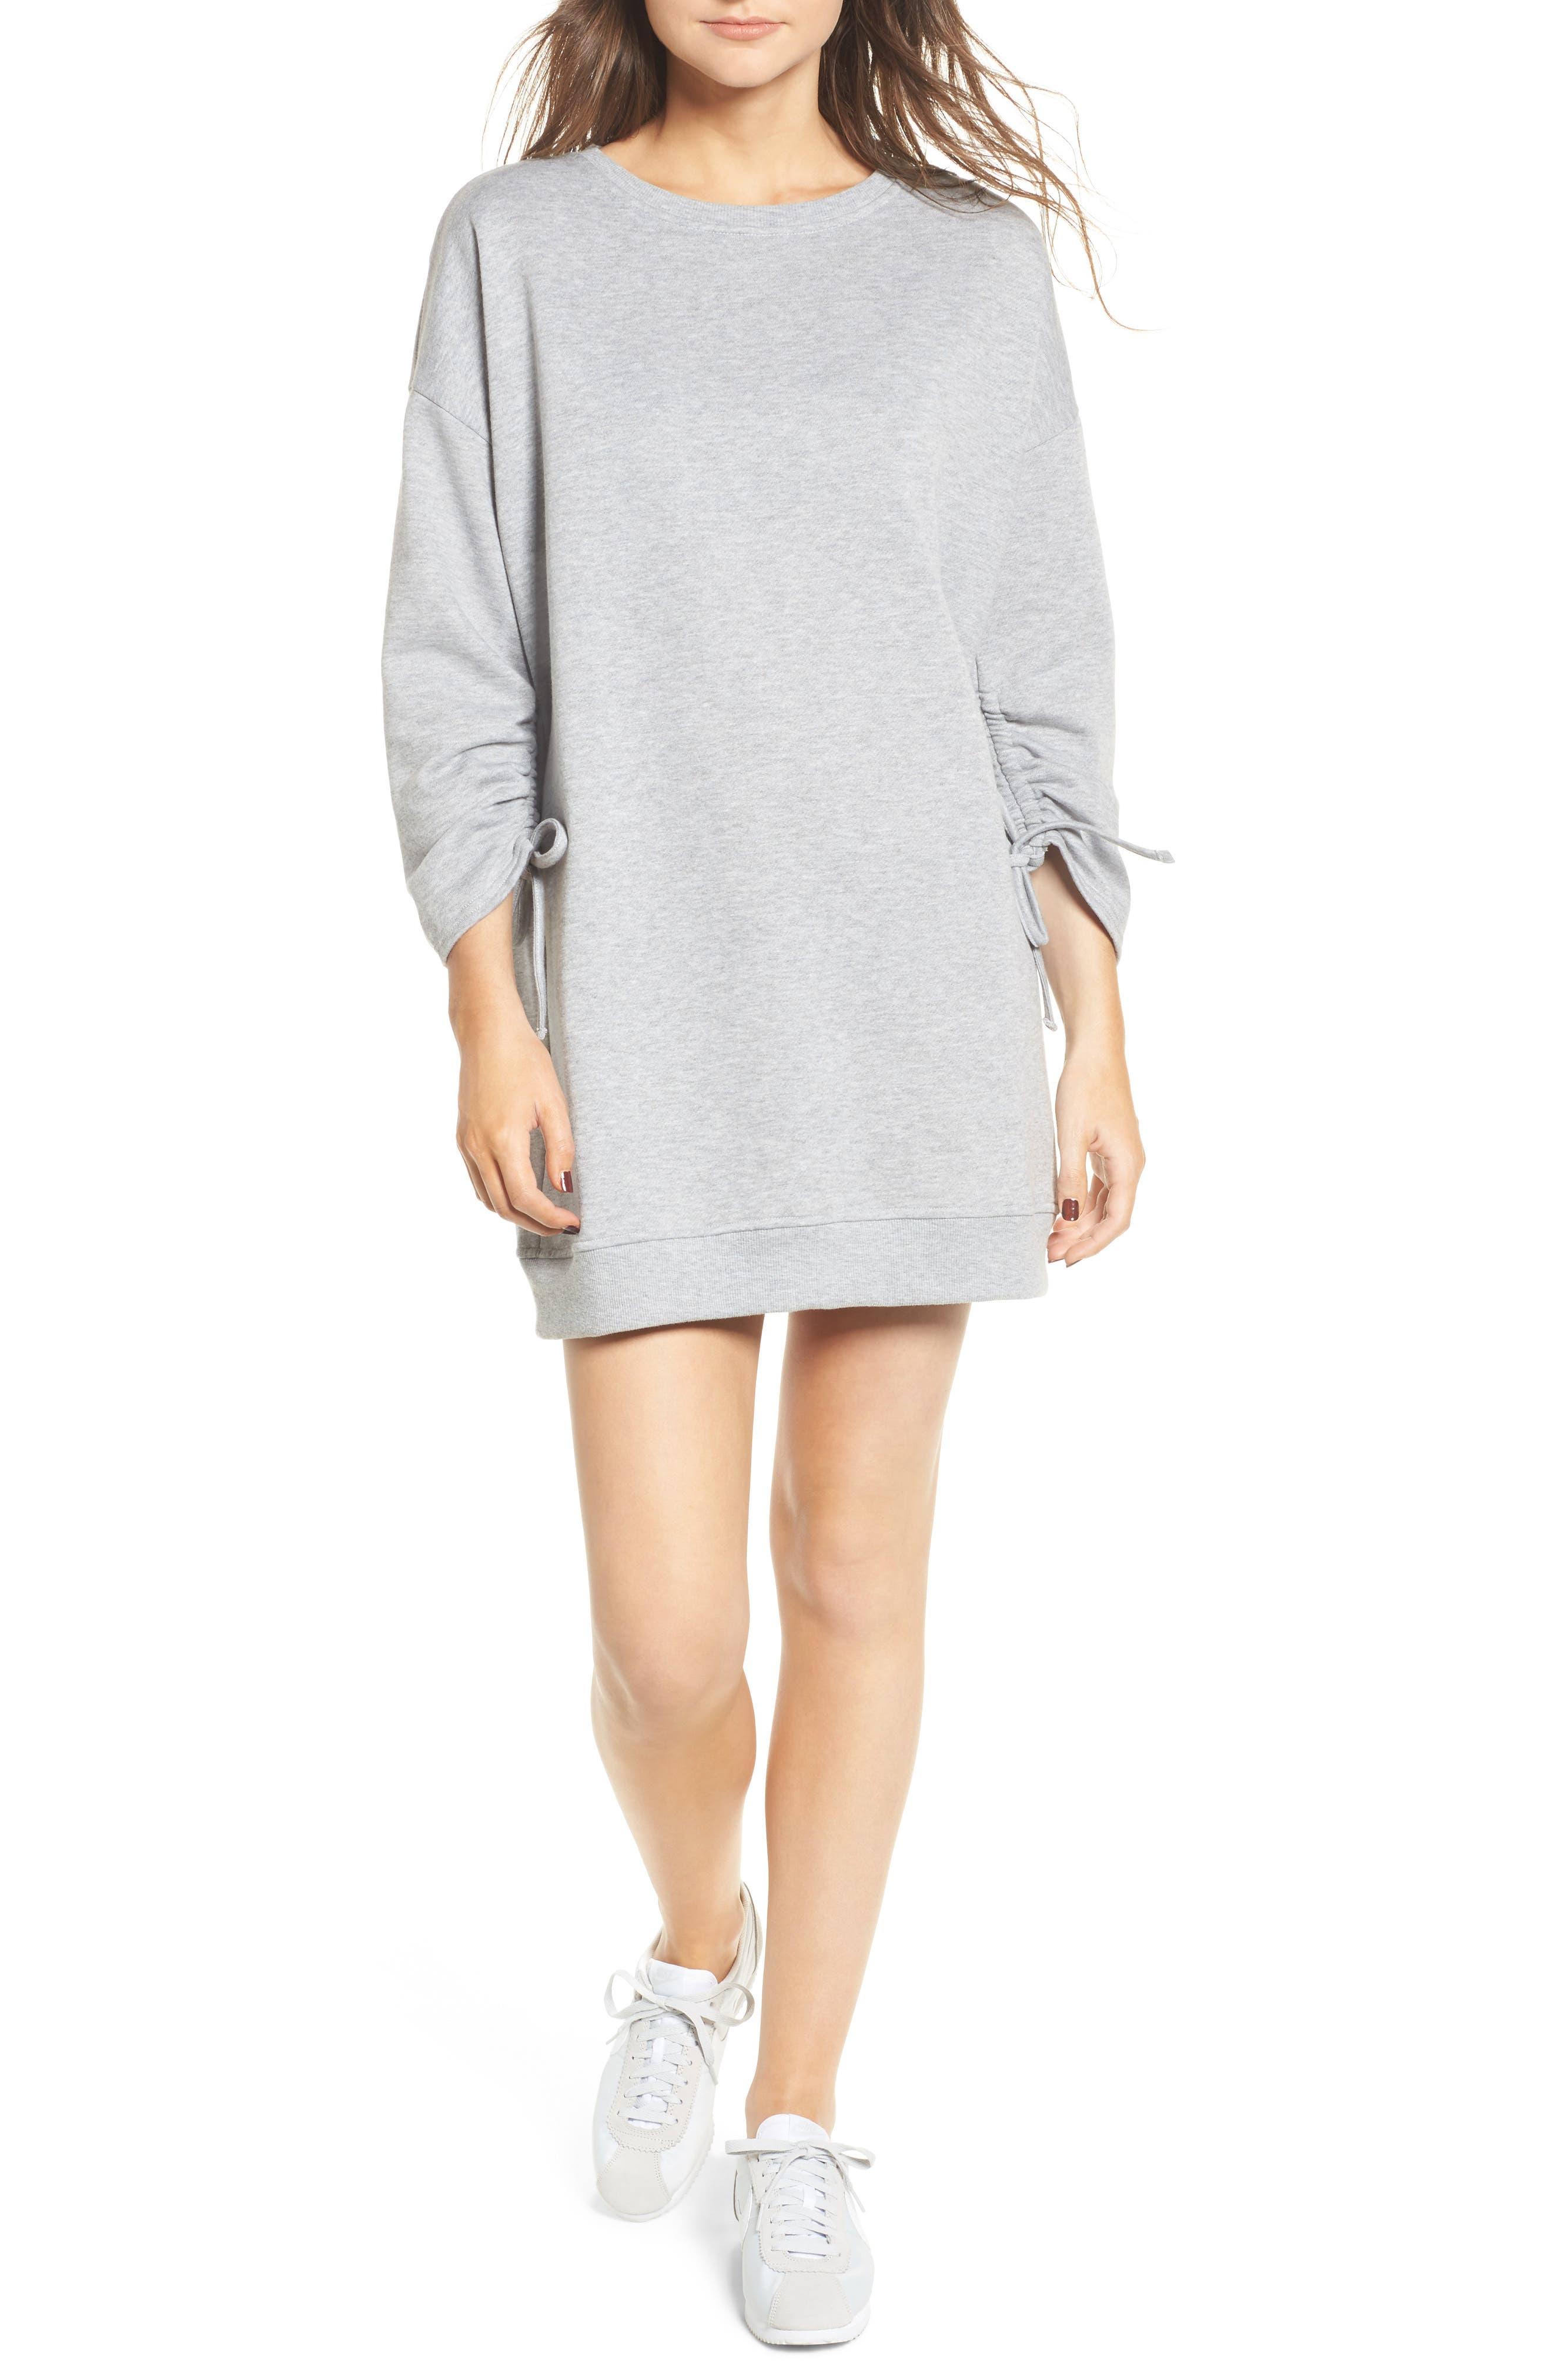 Ruched Sleeve Sweatshirt Dress,                         Main,                         color, 020